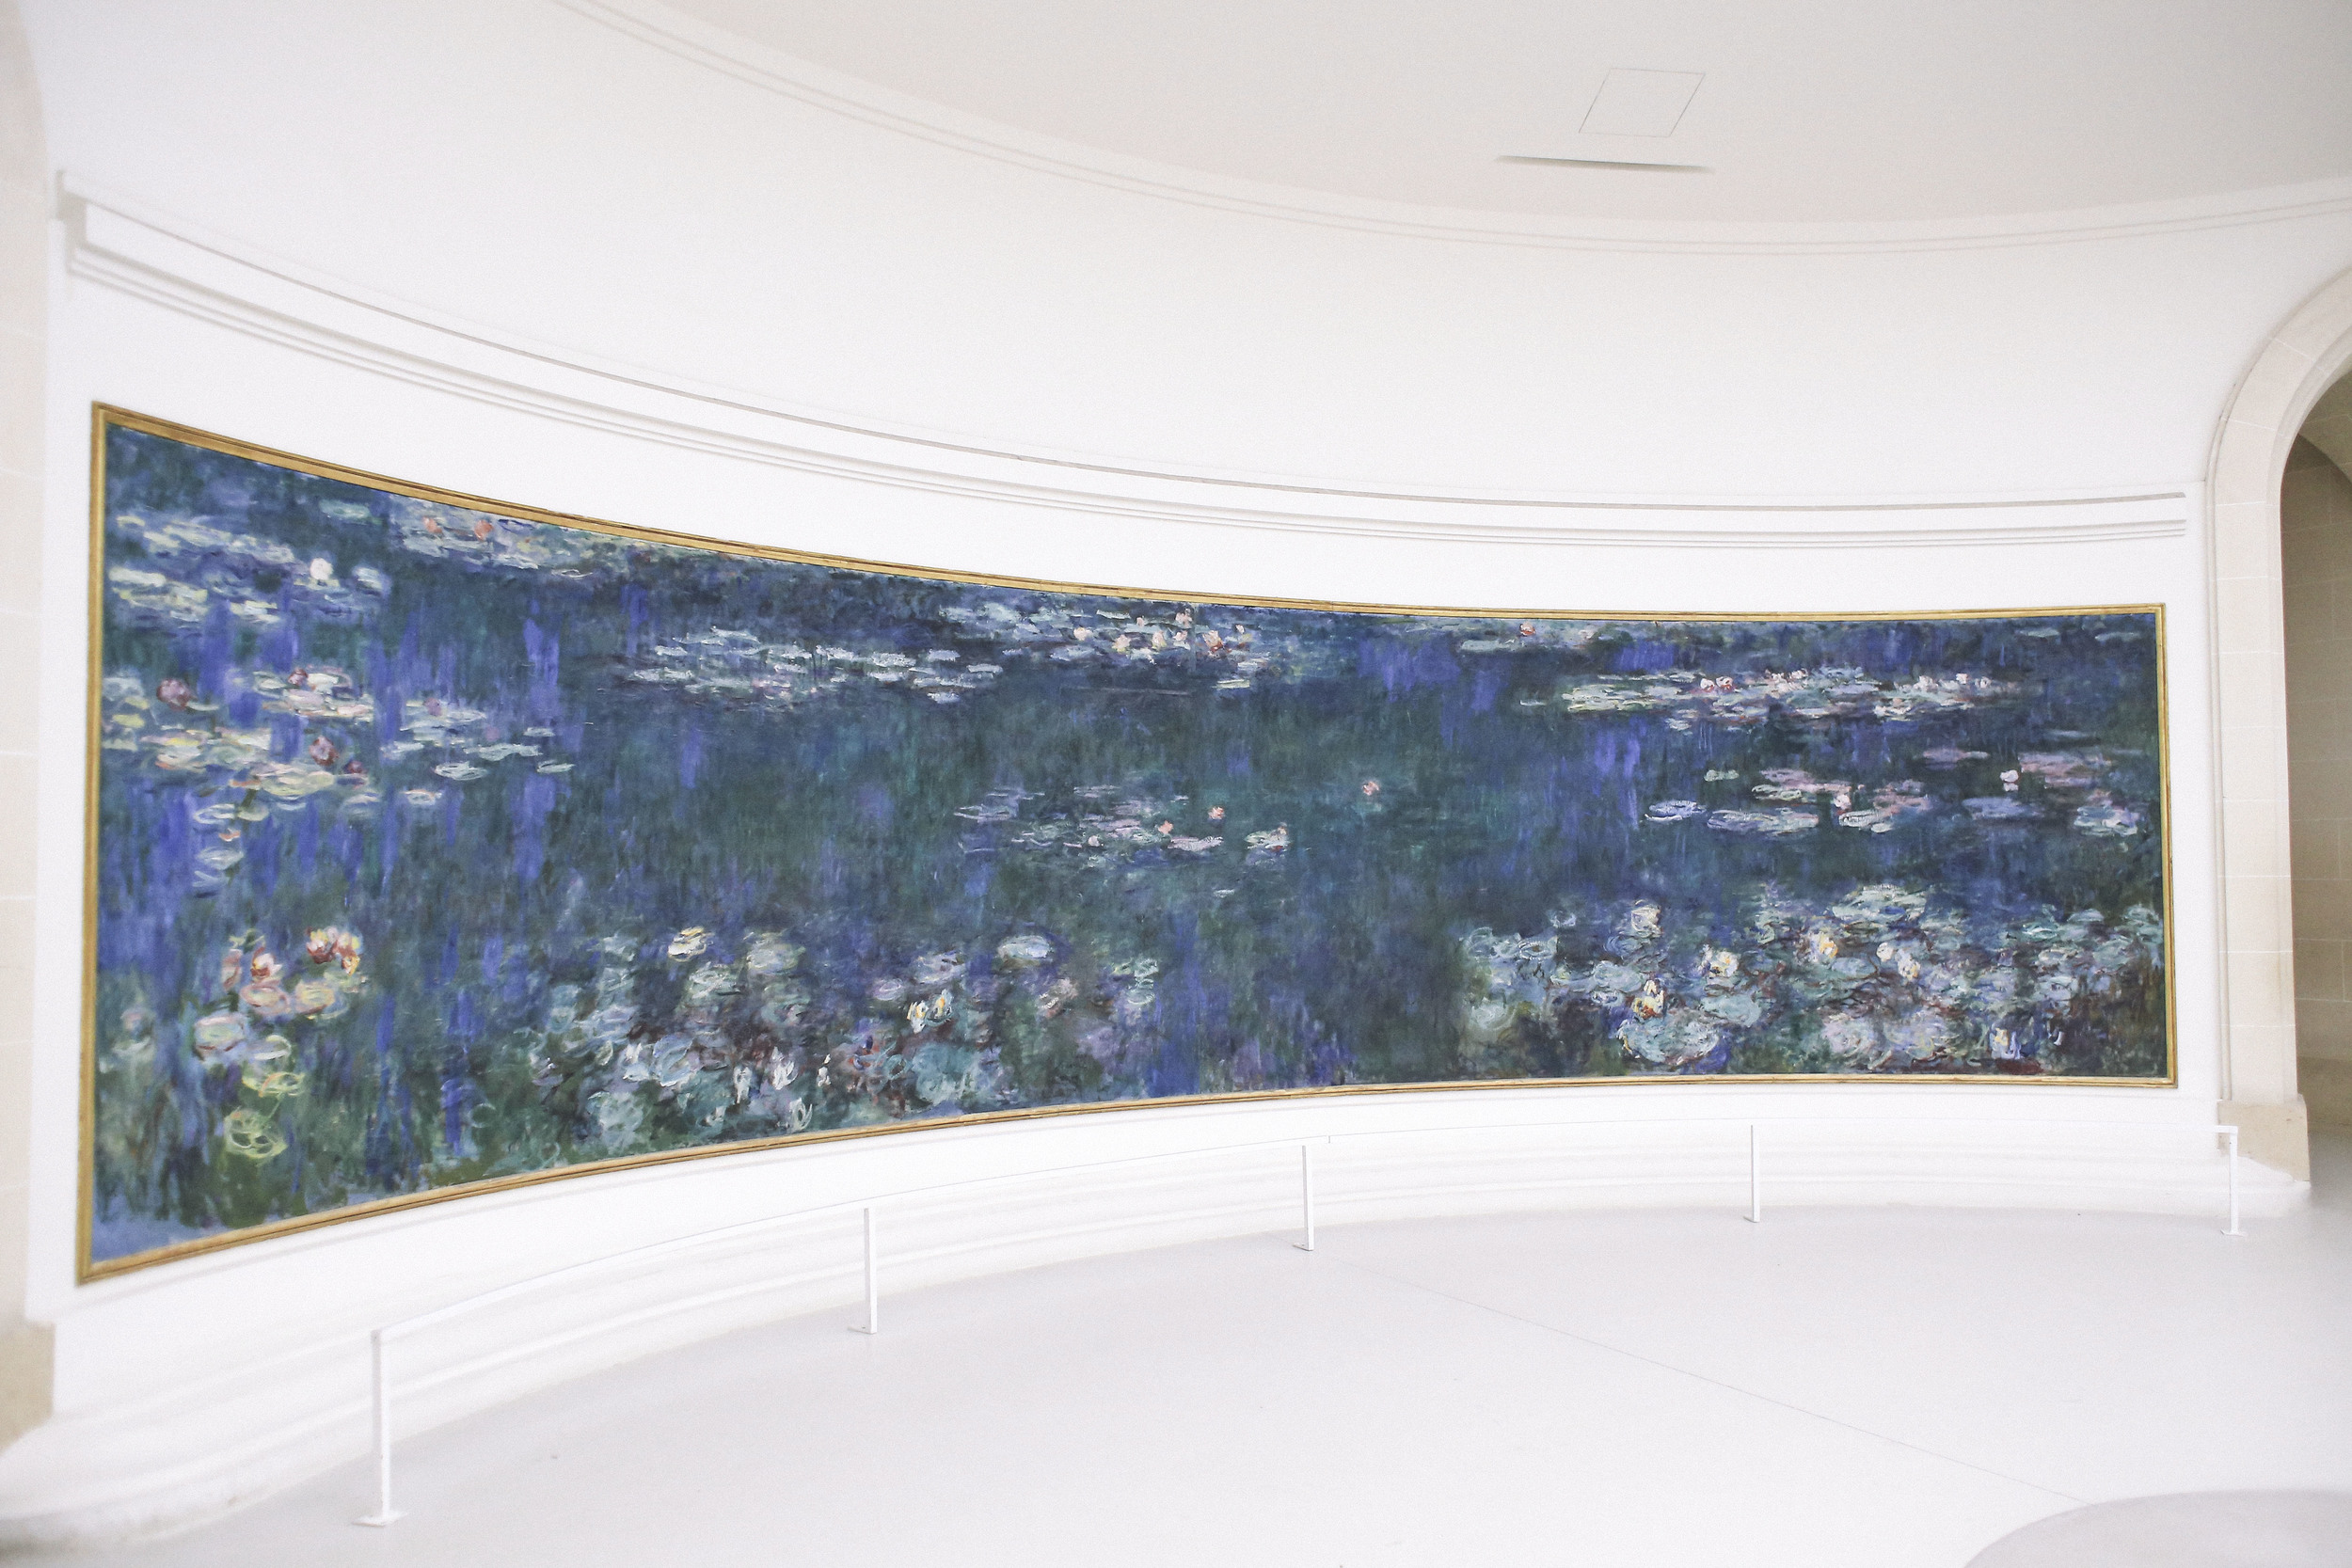 Inside the Musee de l'Orangerie